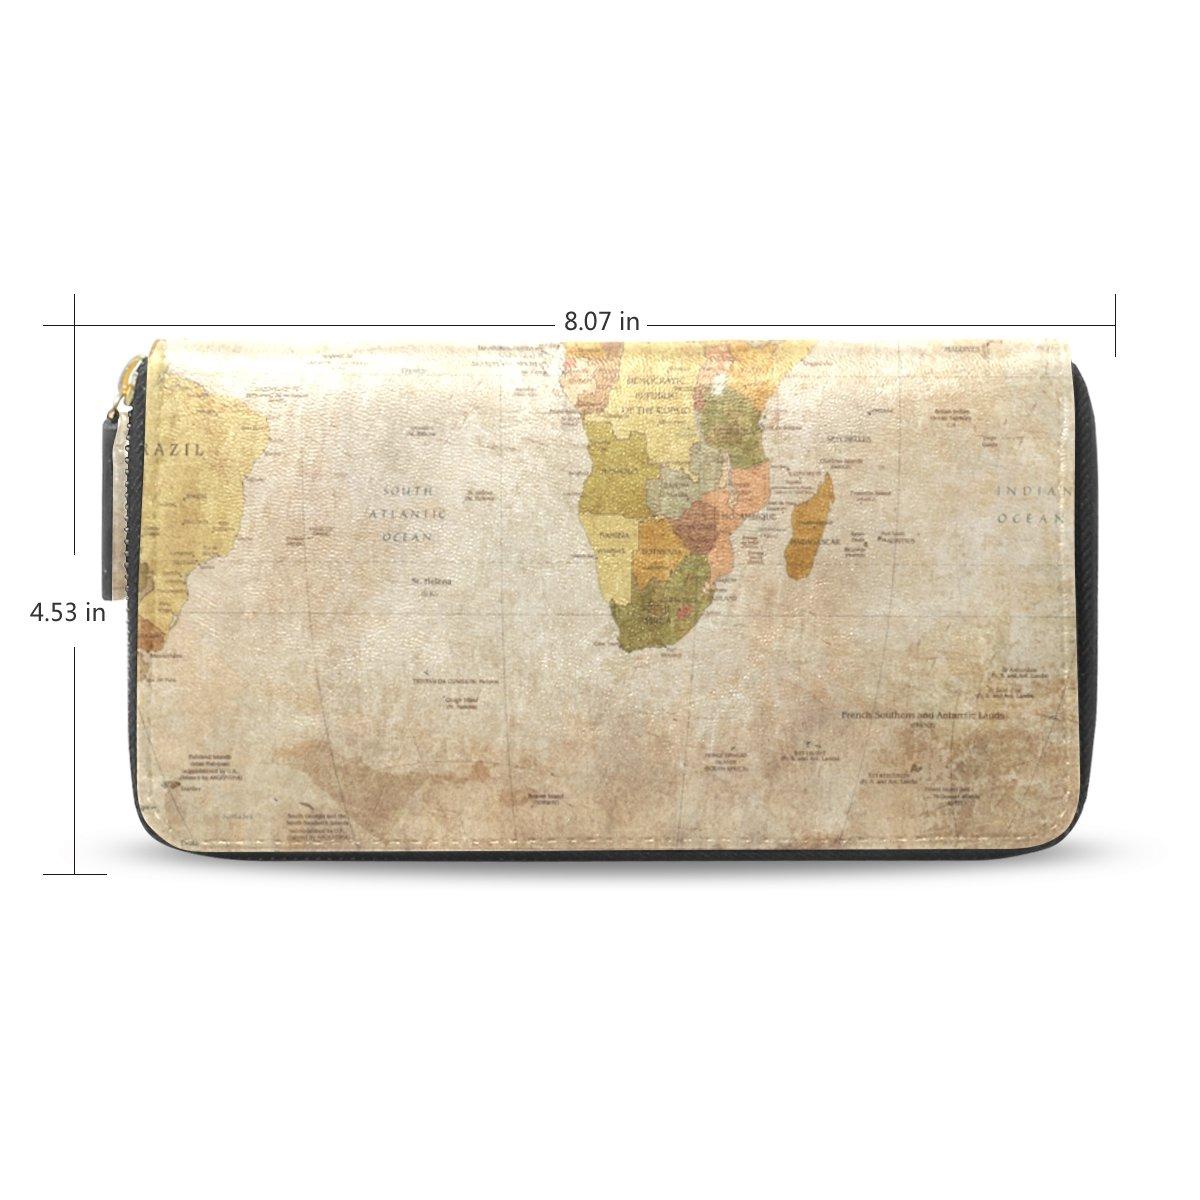 Amazon.com: sunlome mapa del viejo mundo impresión piel ...